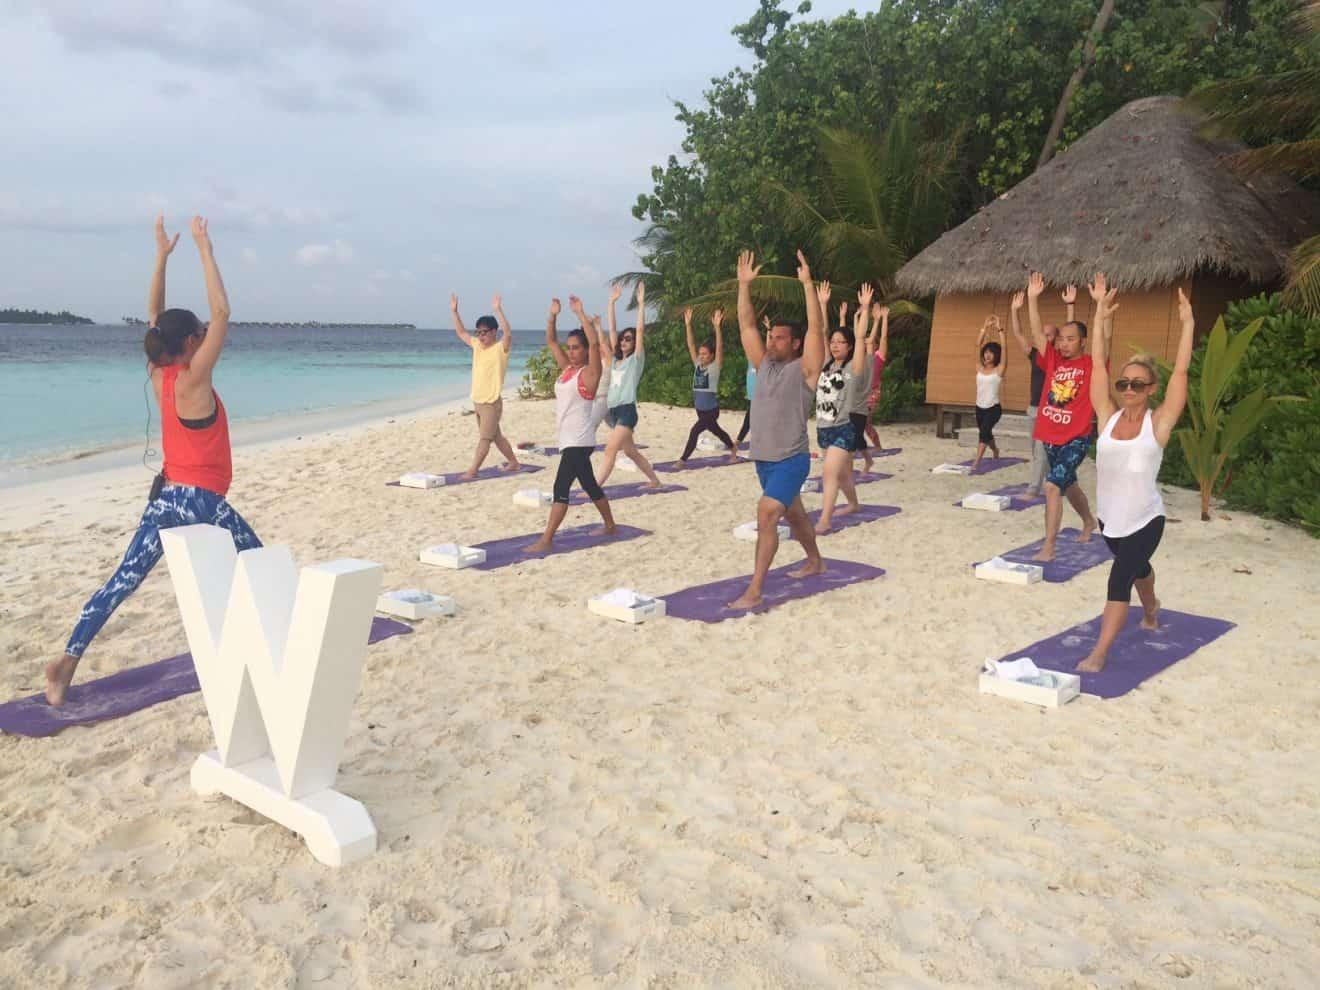 Yoga with Tara as we enjoy the morning sun and breeze